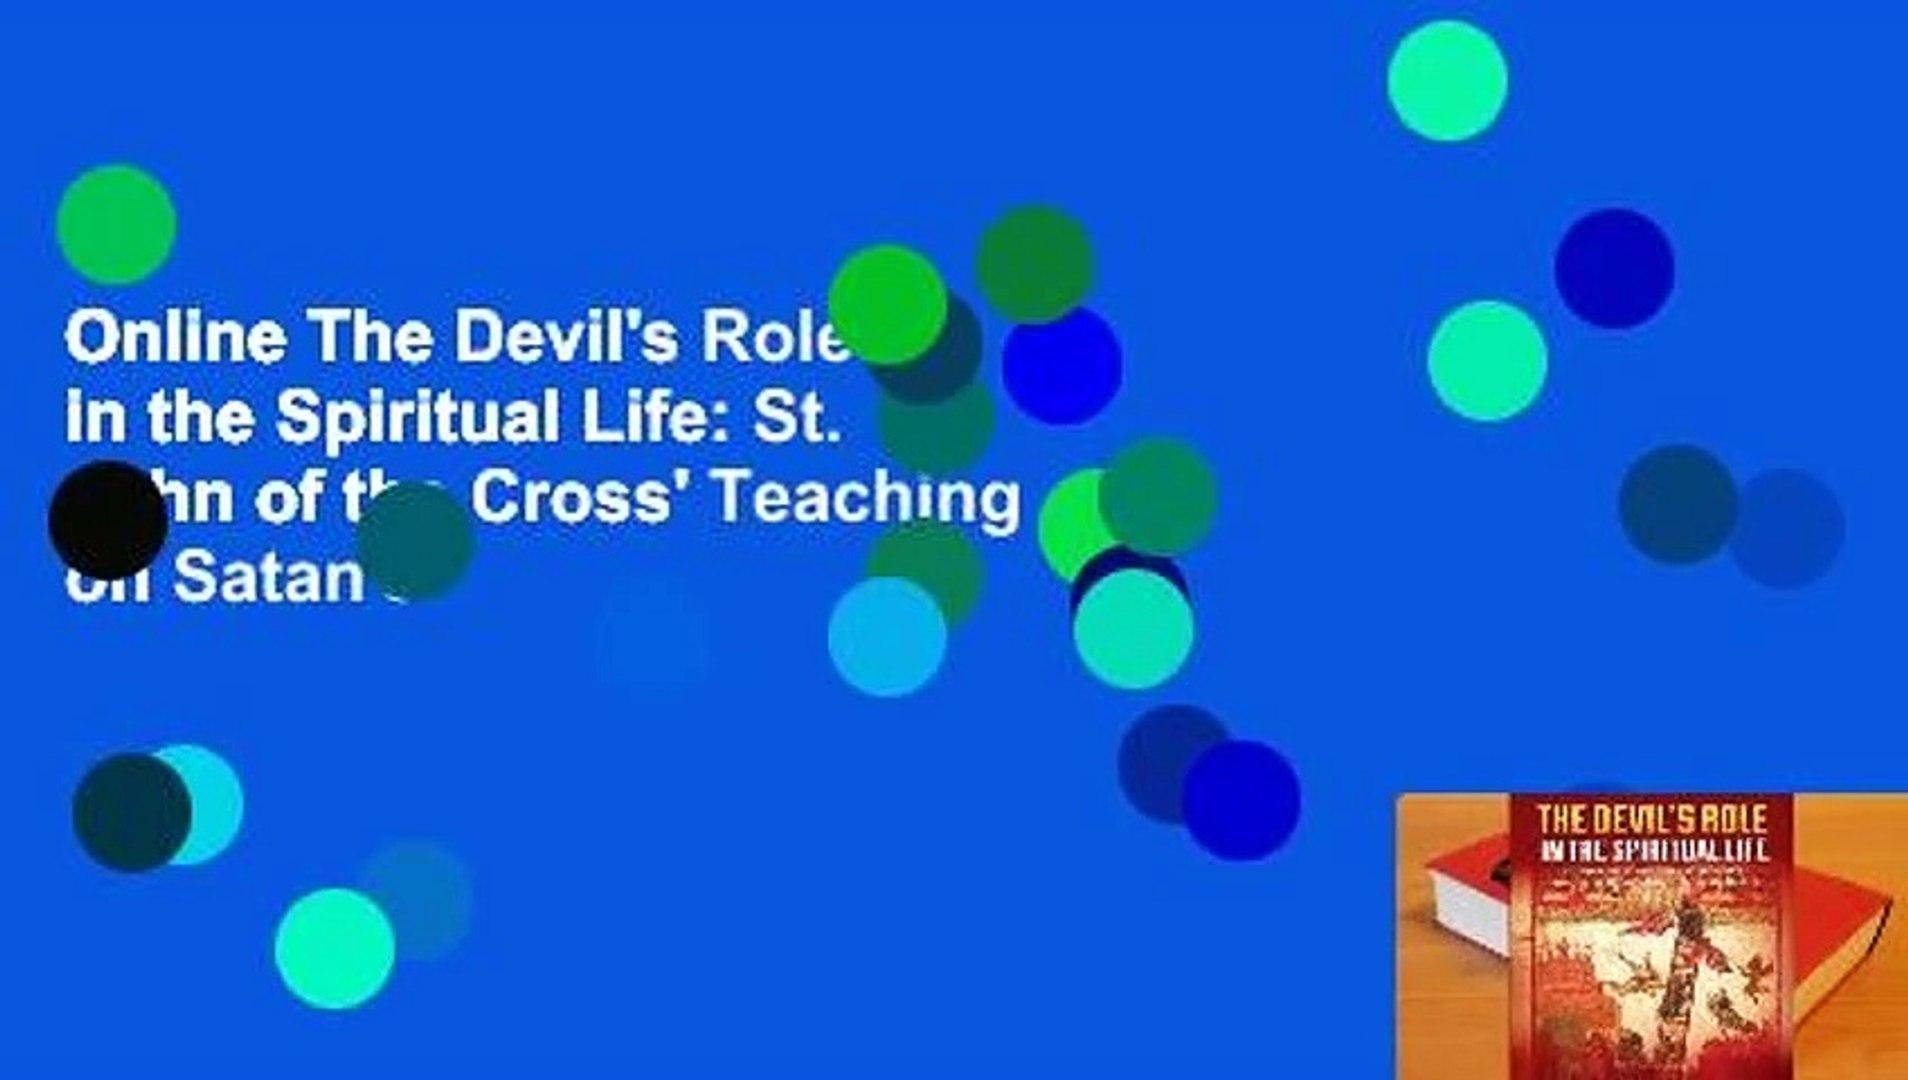 Online The Devil's Role in the Spiritual Life: St. John of the Cross' Teaching on Satan